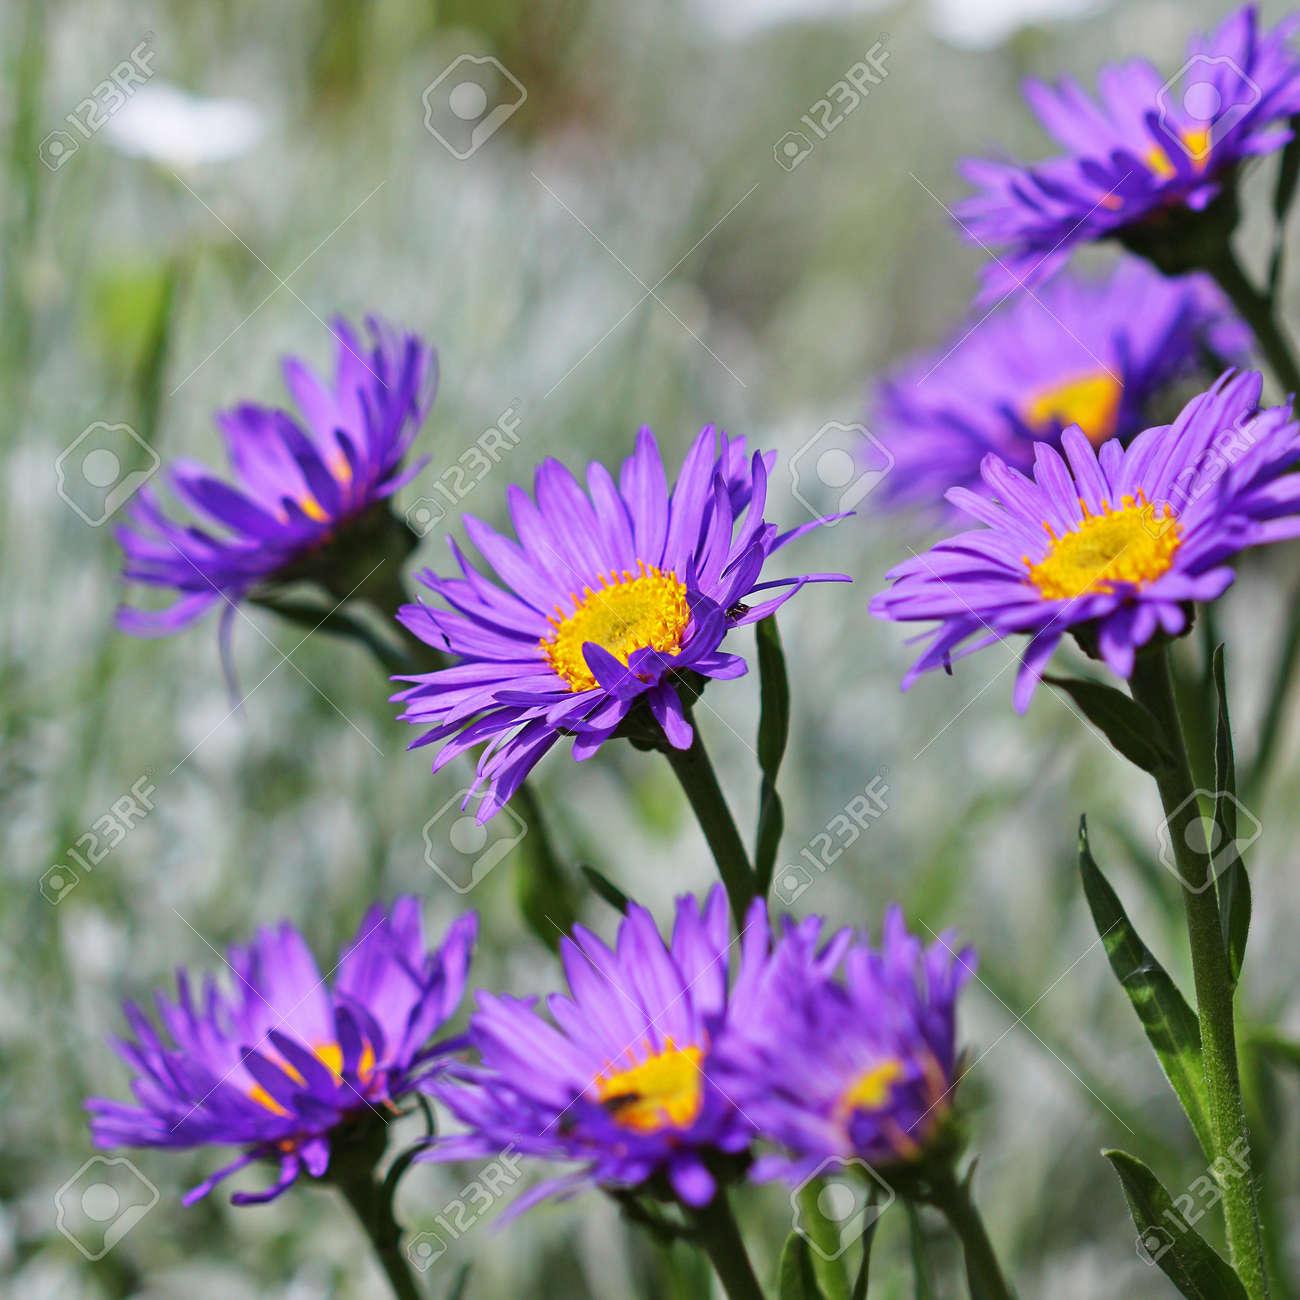 The alpine aster aster alpinus decorative garden plant with stock photo the alpine aster aster alpinus decorative garden plant with blue flowers izmirmasajfo